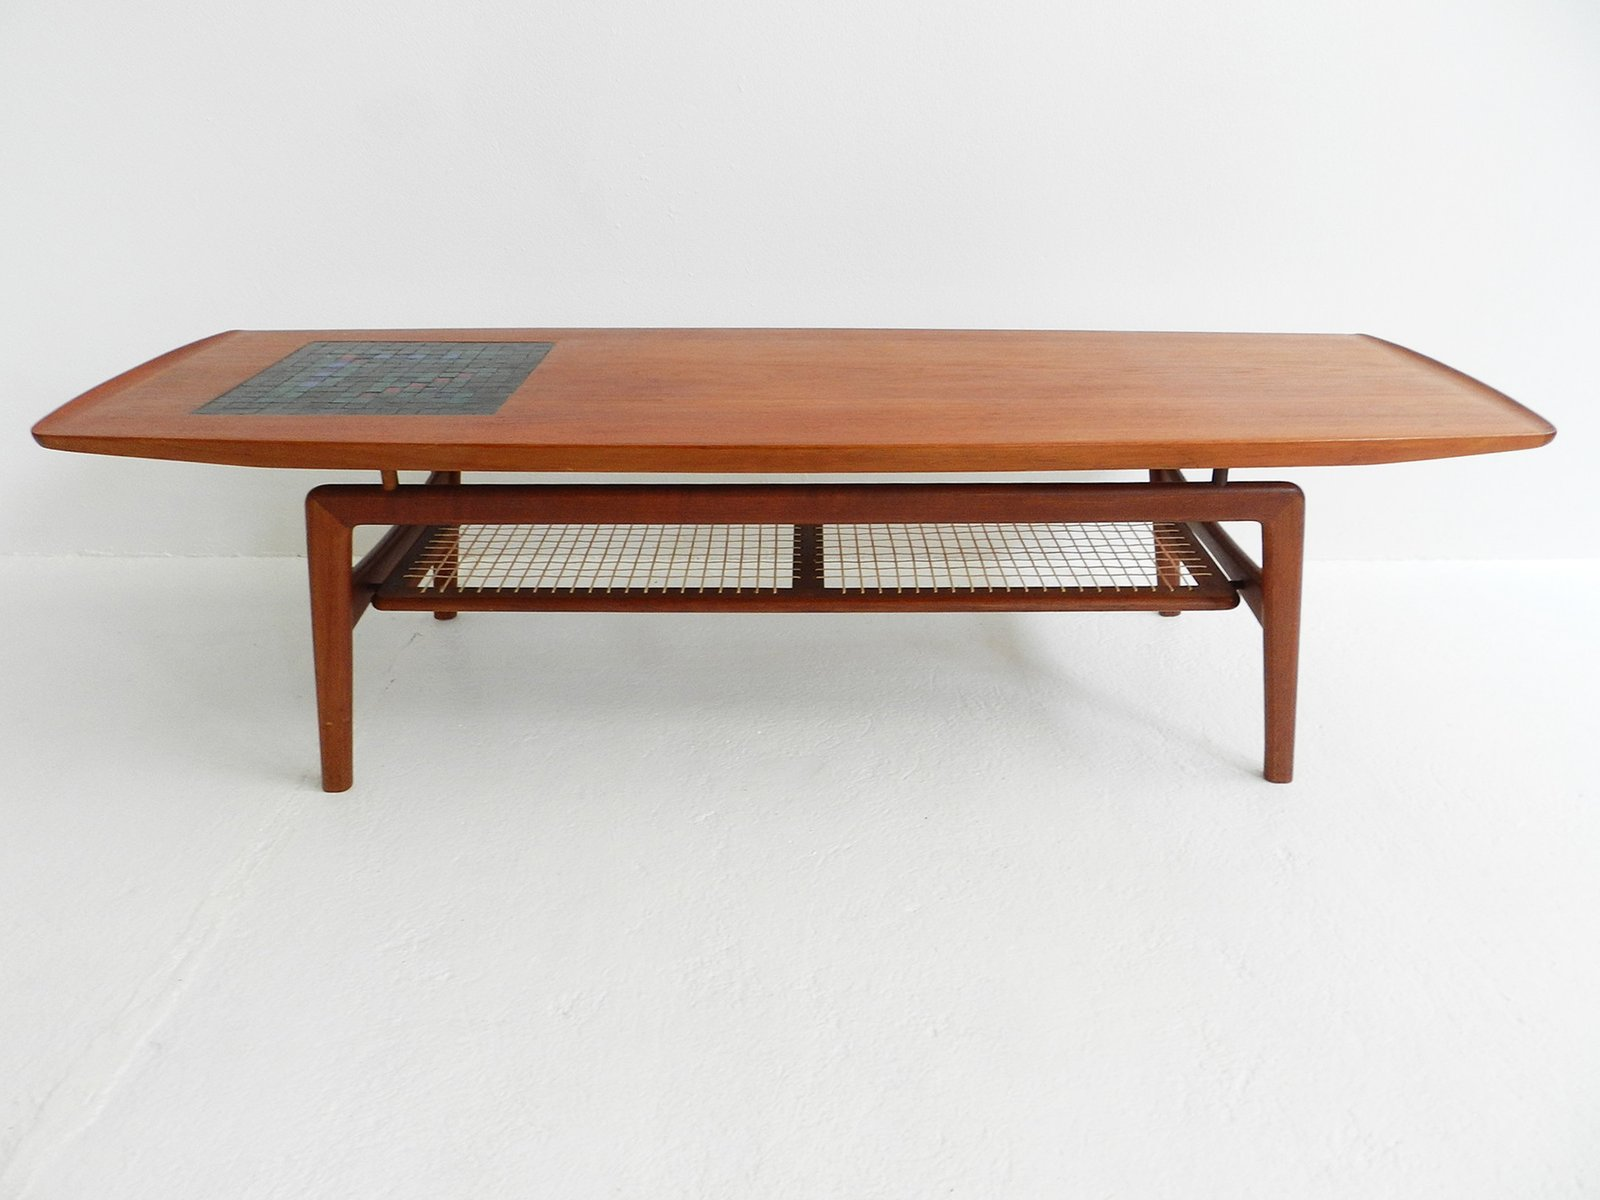 table basse mosa que par arne hovmand olsen pour mogens kold en vente sur pamono. Black Bedroom Furniture Sets. Home Design Ideas